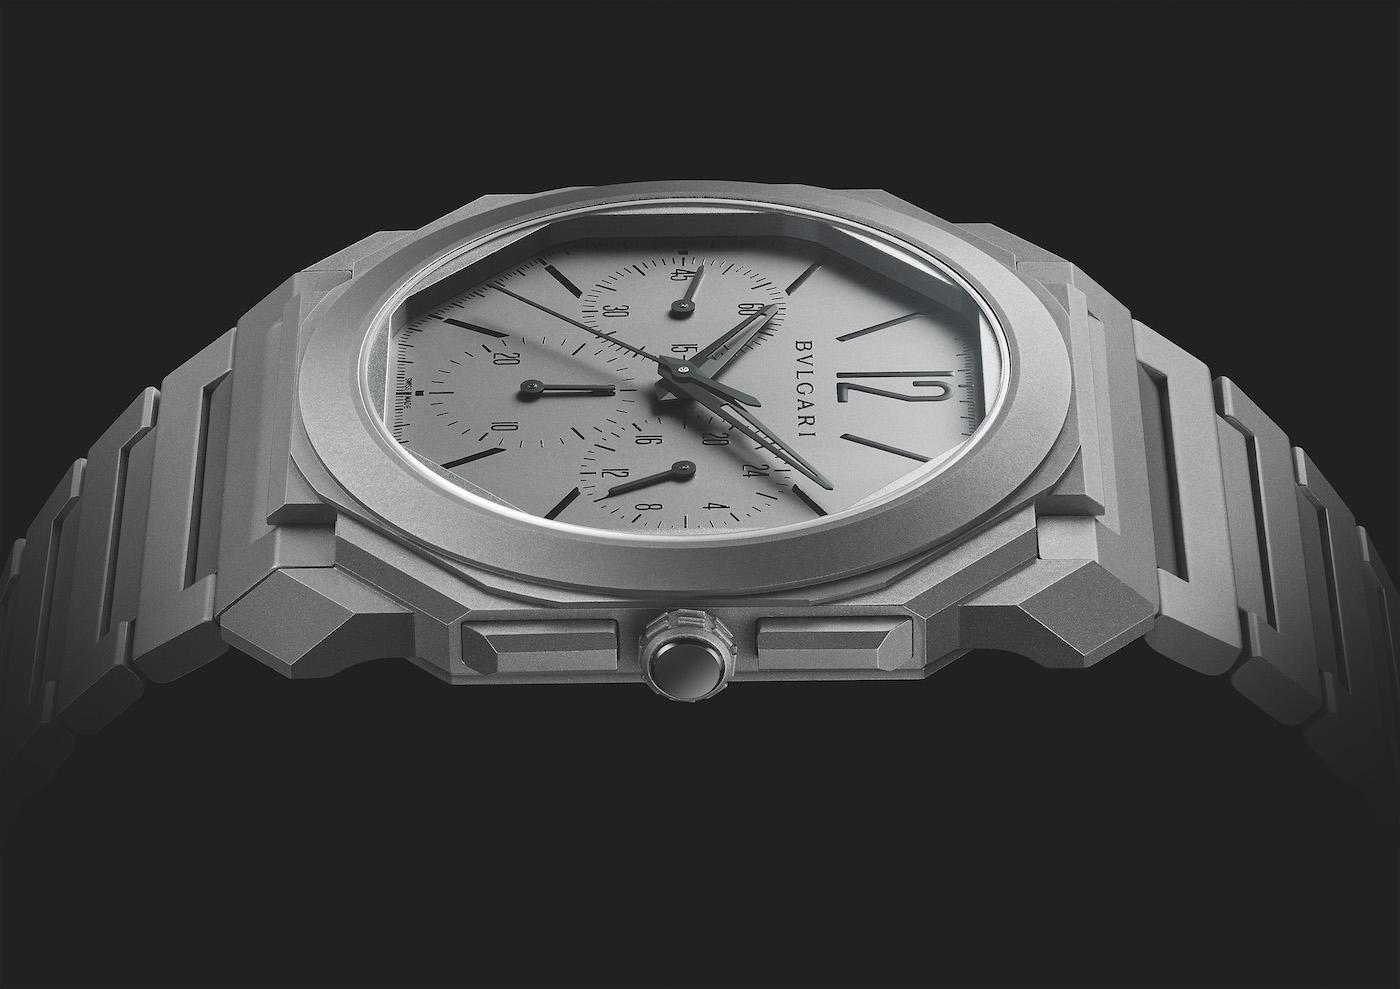 Bulgari Octo Finissimo Chronograph GMT Automatic (GPHG 2019)